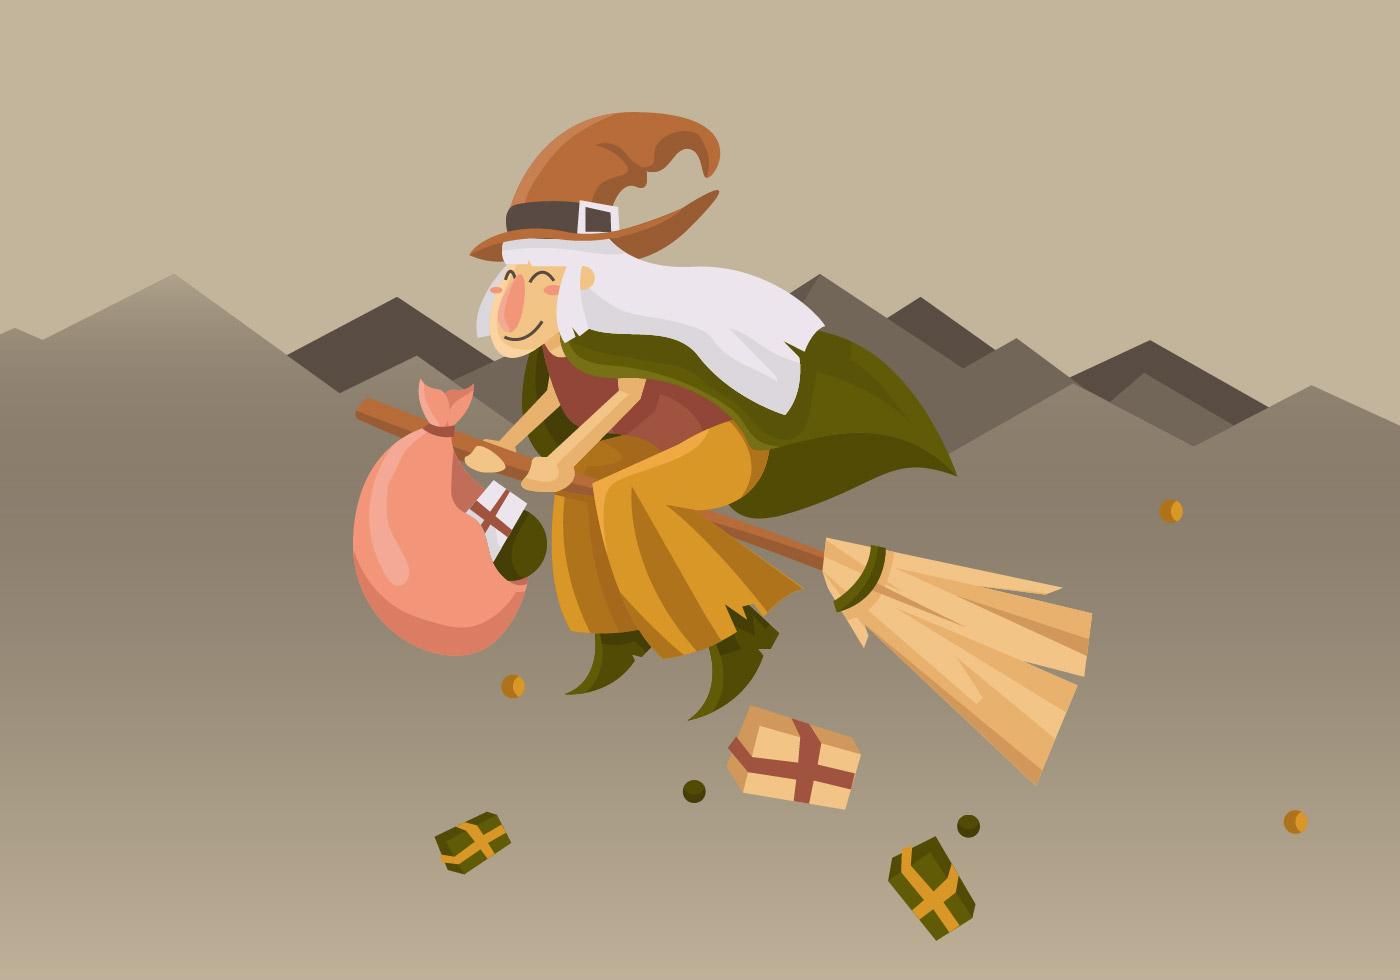 Cute Befana Flying With Broom Vector Illustration